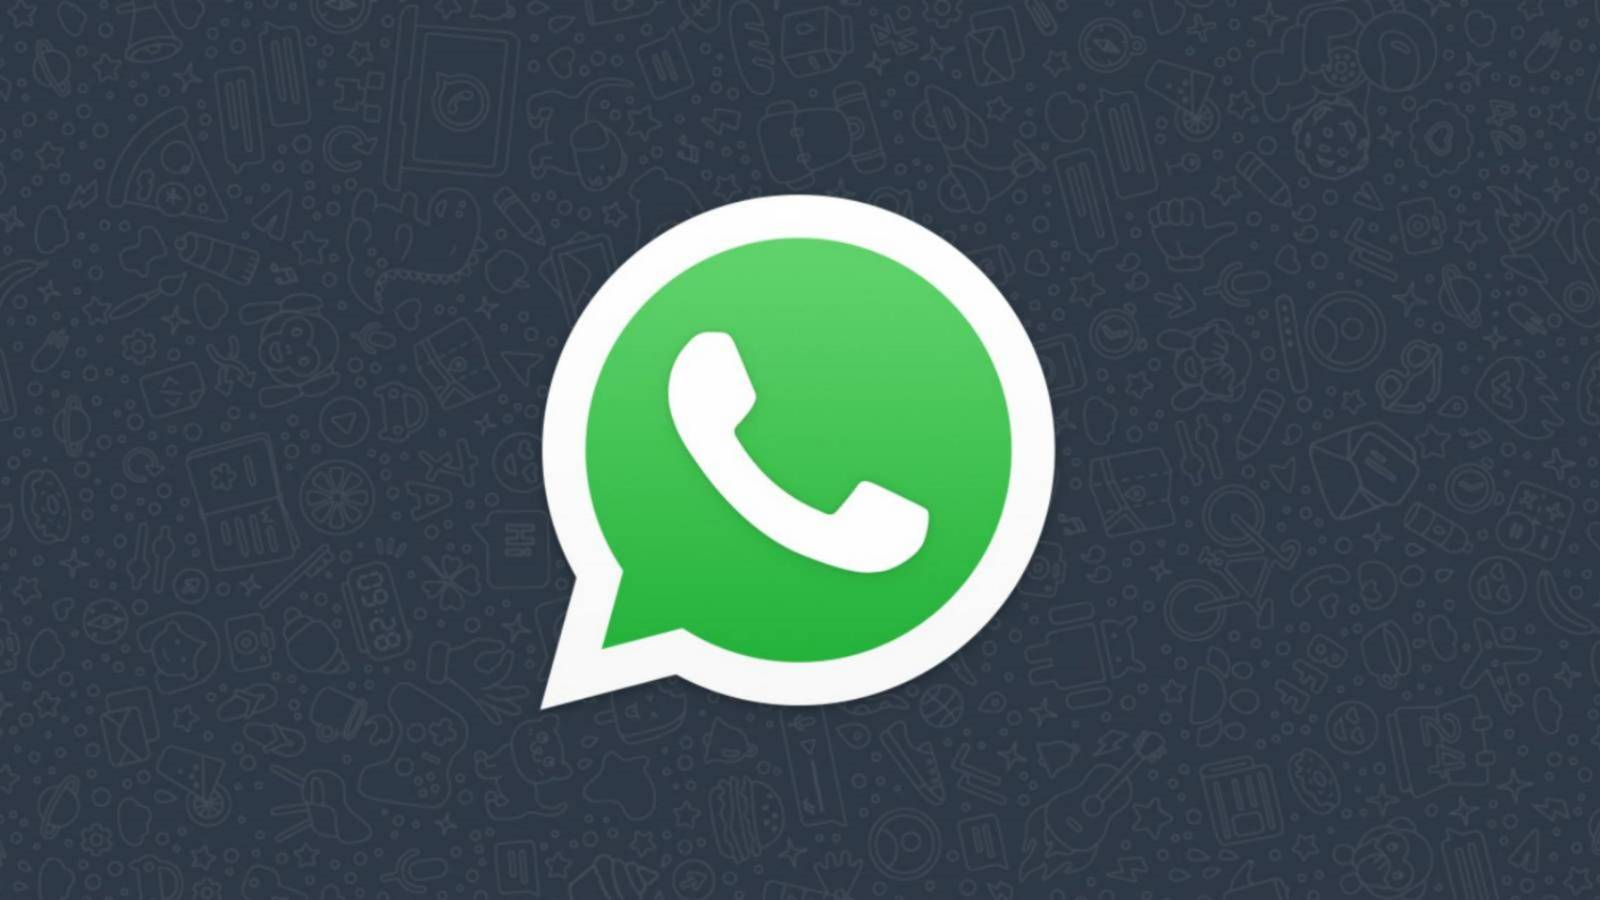 WhatsApp: TRUCUL GROZAV Tinut SECRET fata de Multi Oameni